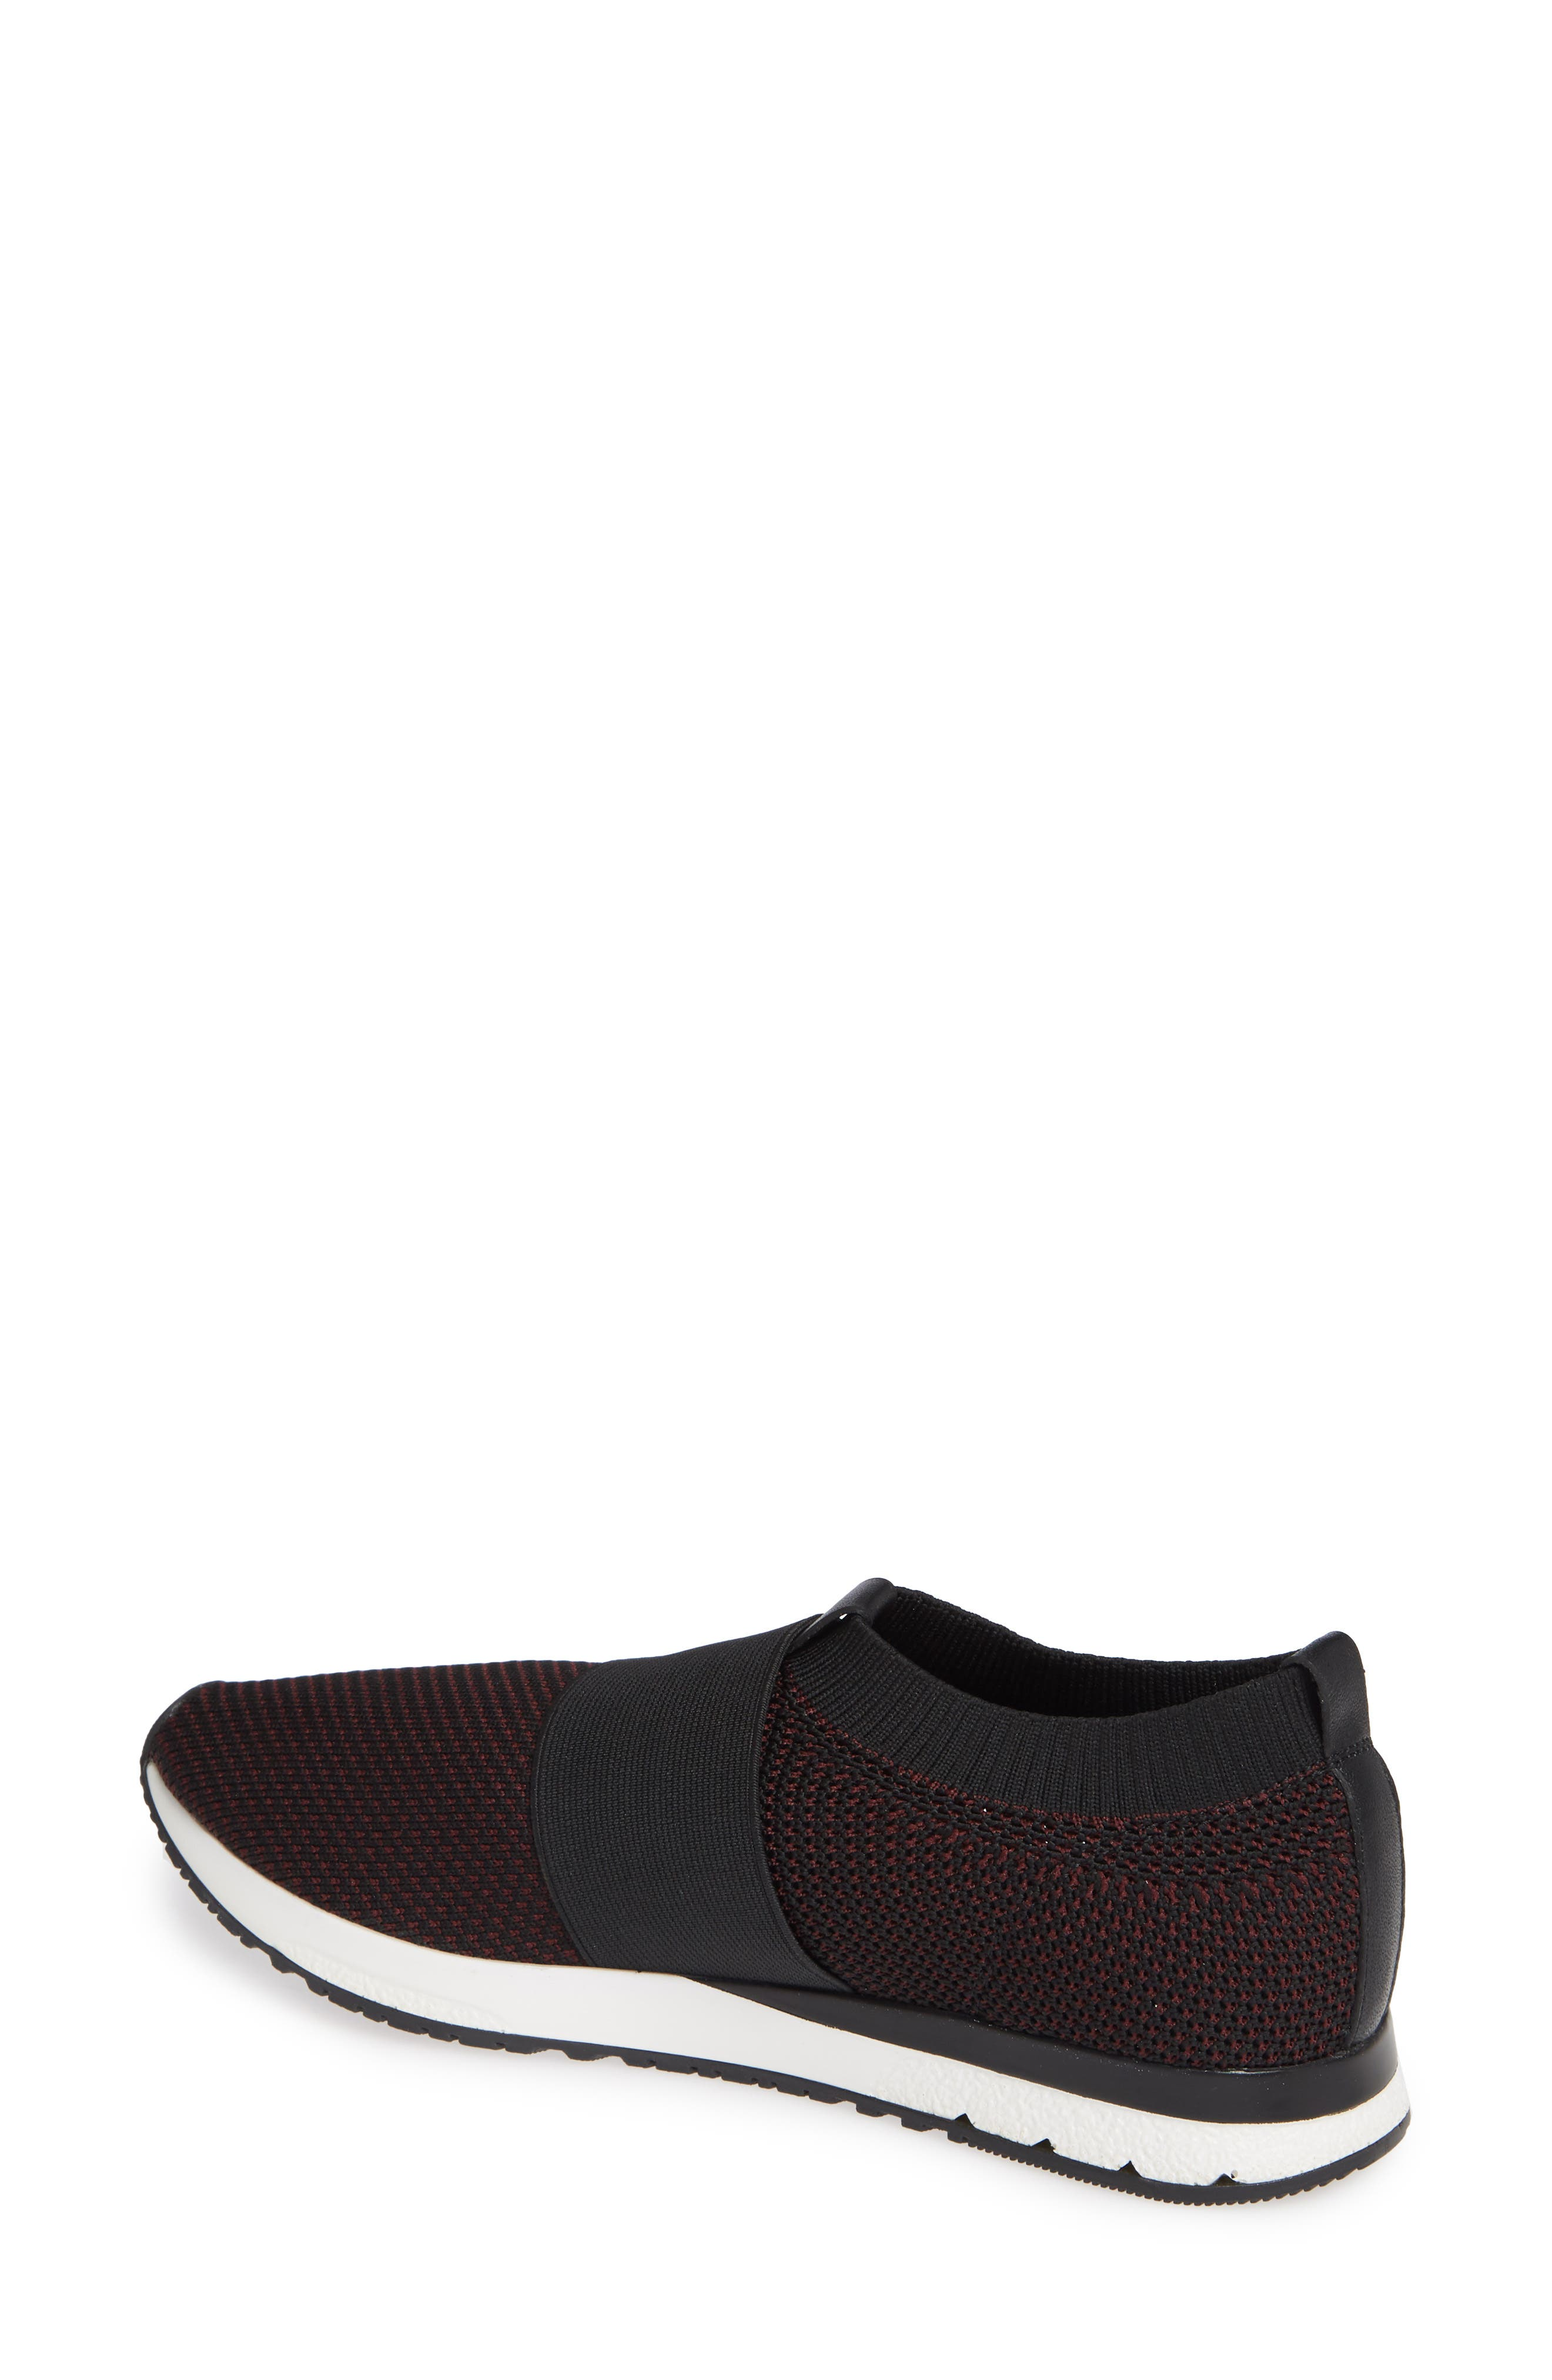 Brooke Slip-On Sneaker,                             Alternate thumbnail 2, color,                             Black/ Wine Knit Fabric